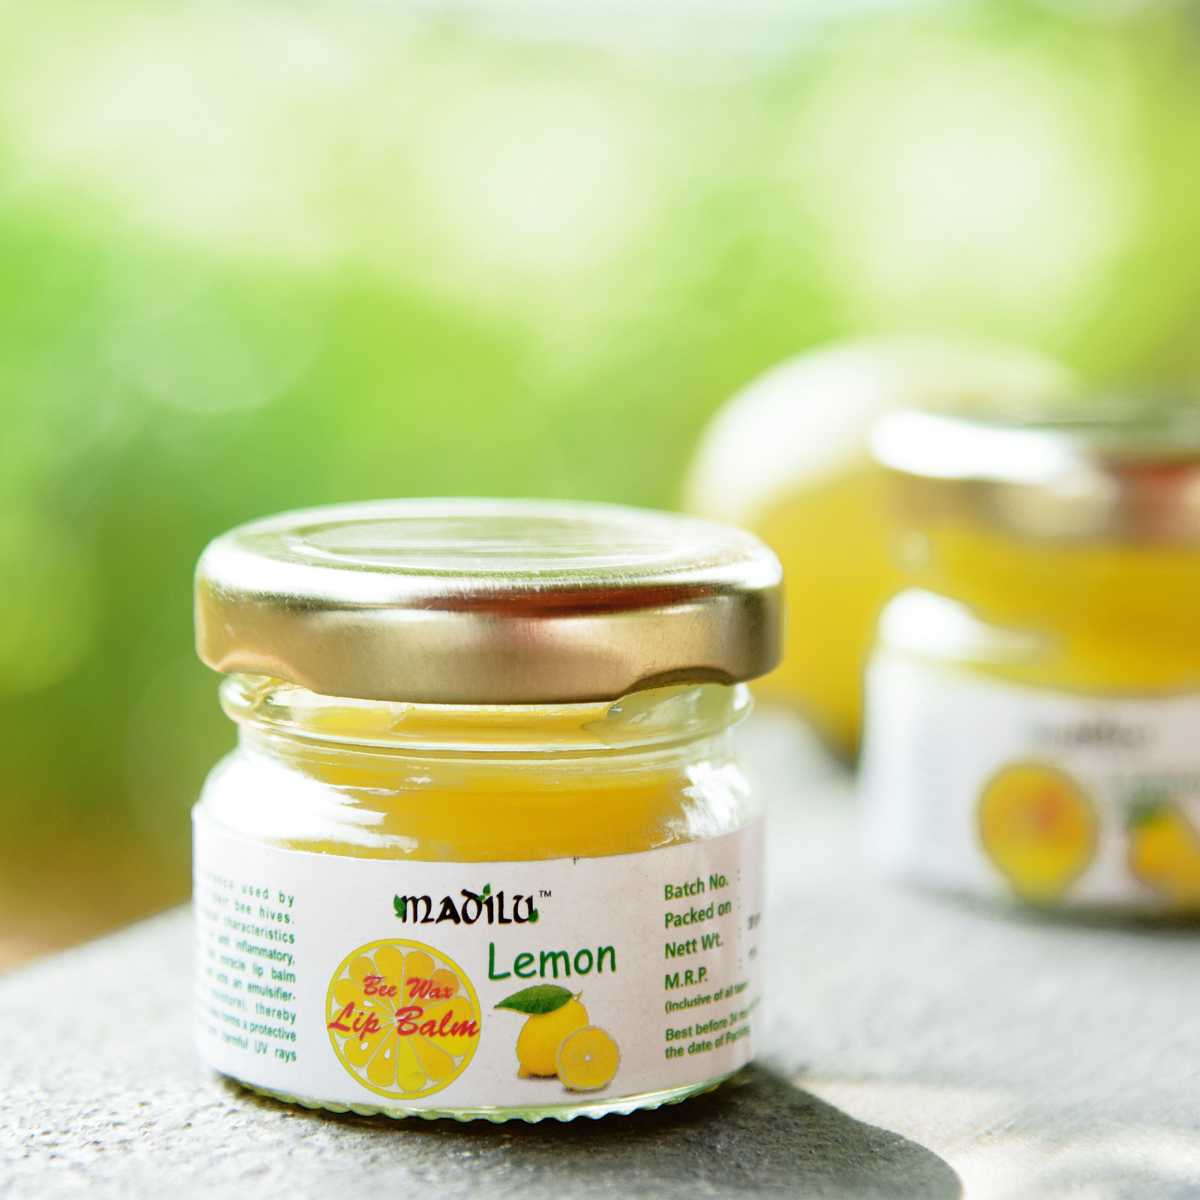 special bee wax lip balm - Lemon(set of 3)